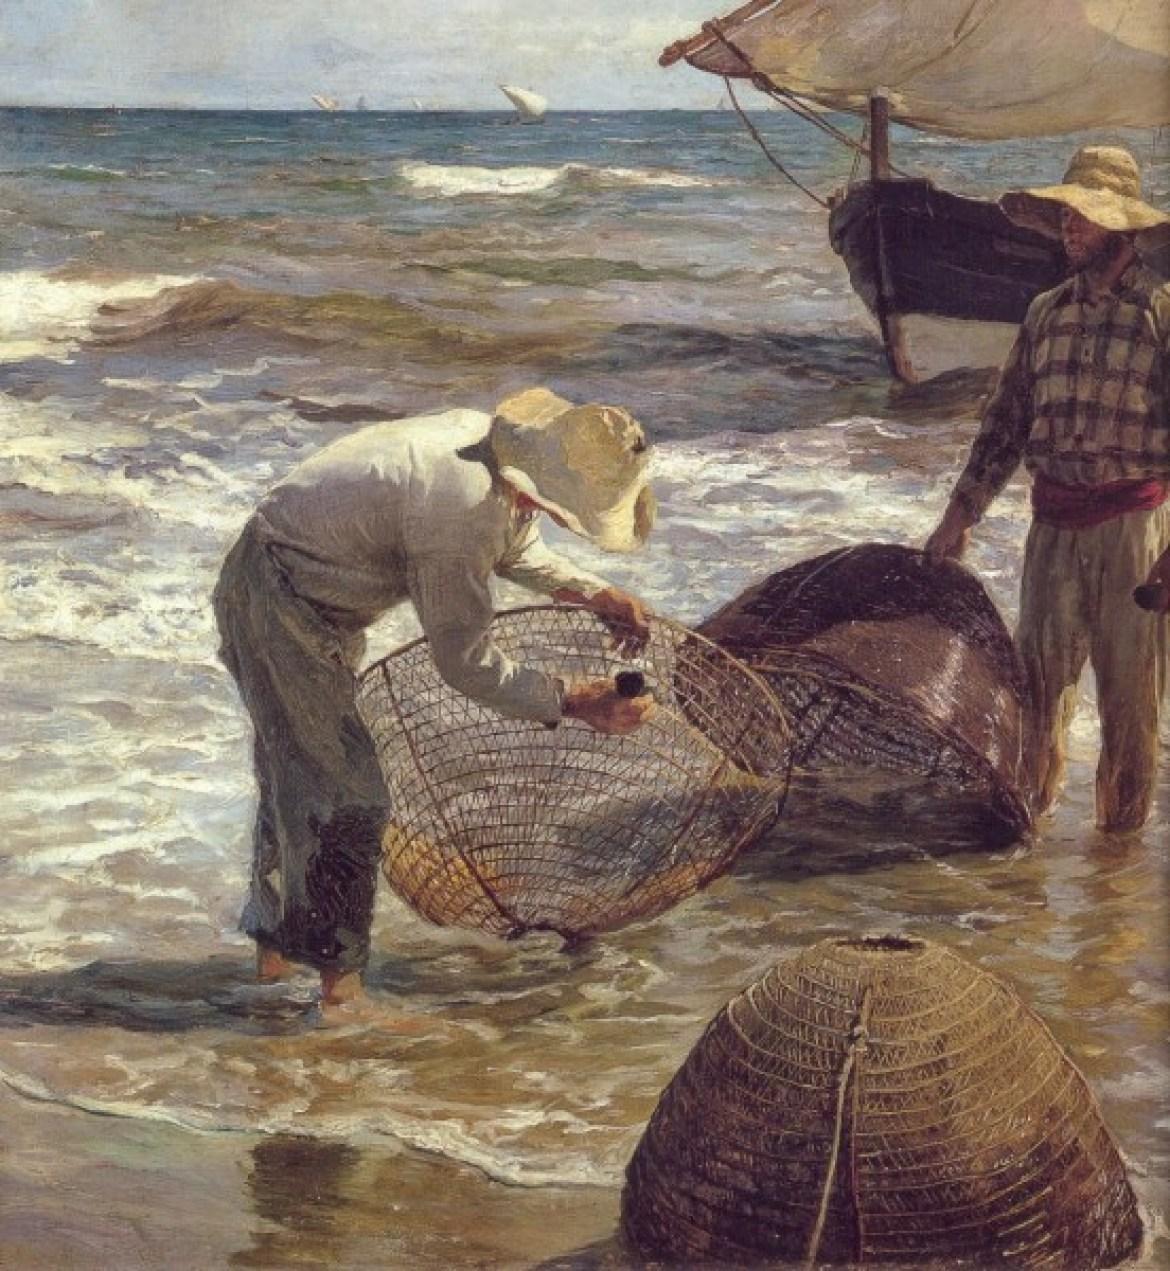 Fisherman of Valencia, Pescadores de Valencia